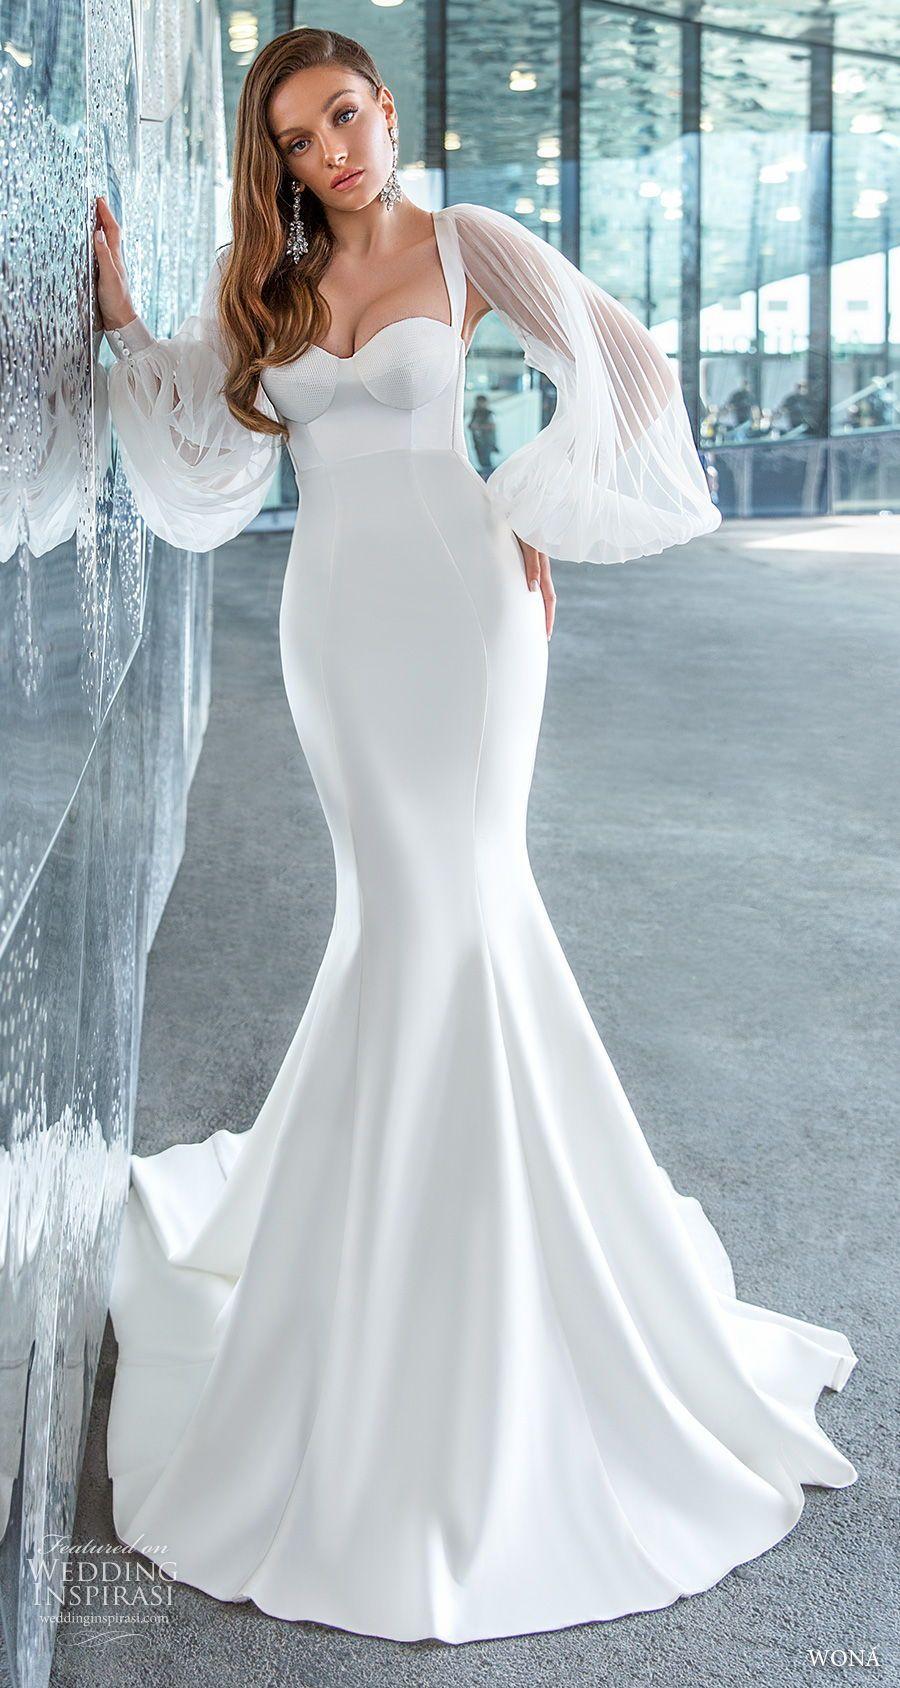 Wona Concept 2020 Diva Weddding Dresses Wedding Inspirasi Satin Mermaid Wedding Dress Wedding Dresses Bride Dress Vintage [ 1688 x 900 Pixel ]